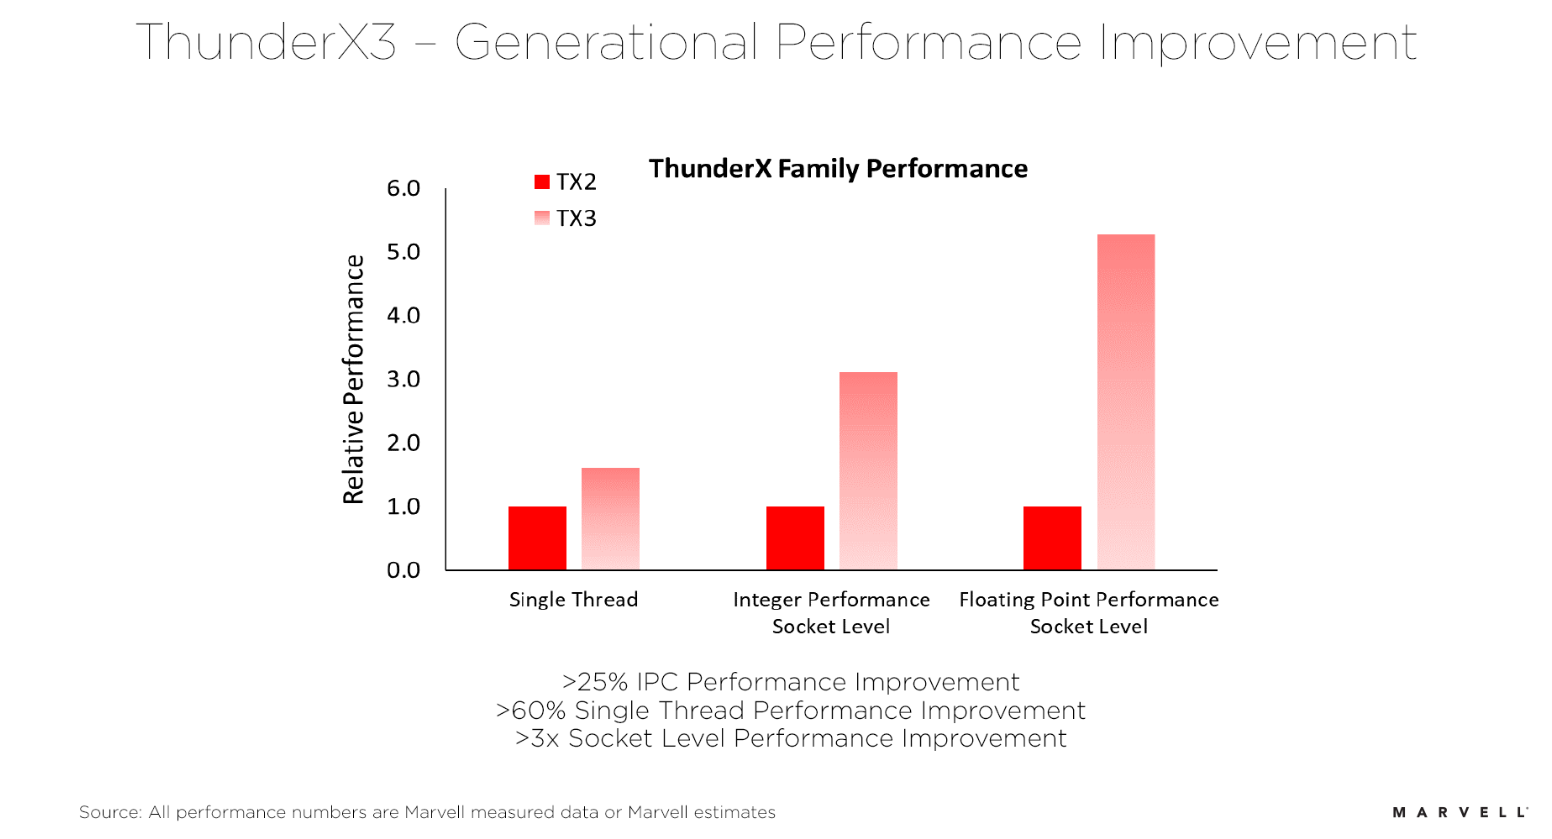 新一代Marvell ThunderX3為雲計算和HPC服務器(qi)市(shi)場帶來性能和功耗(hao)雙提升